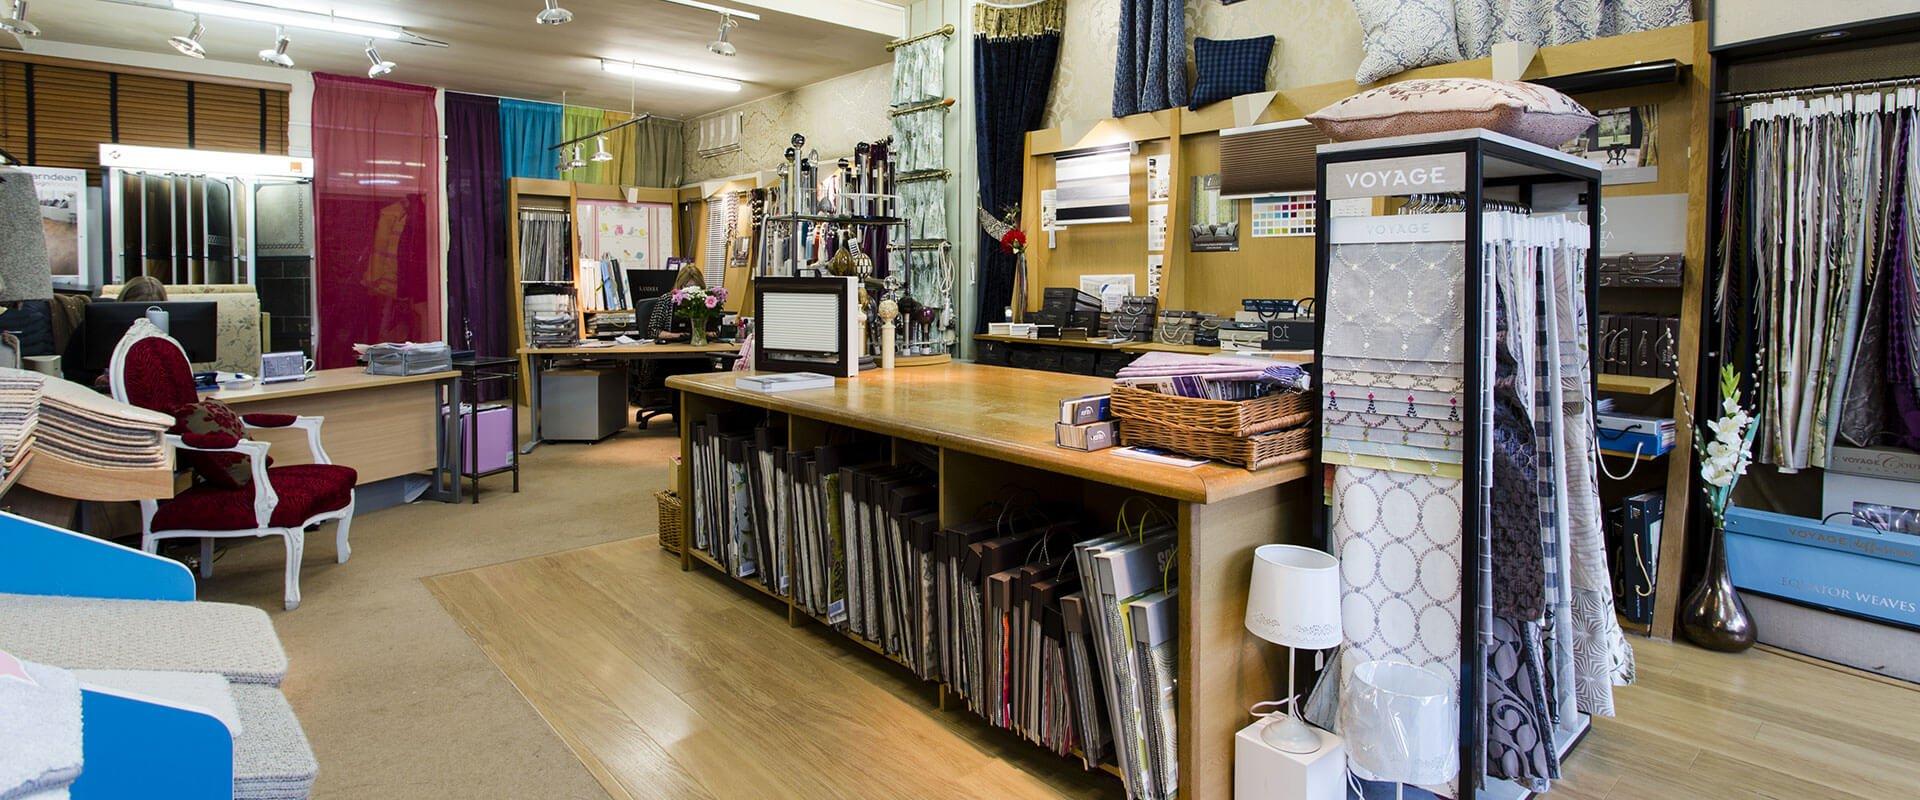 the store interior